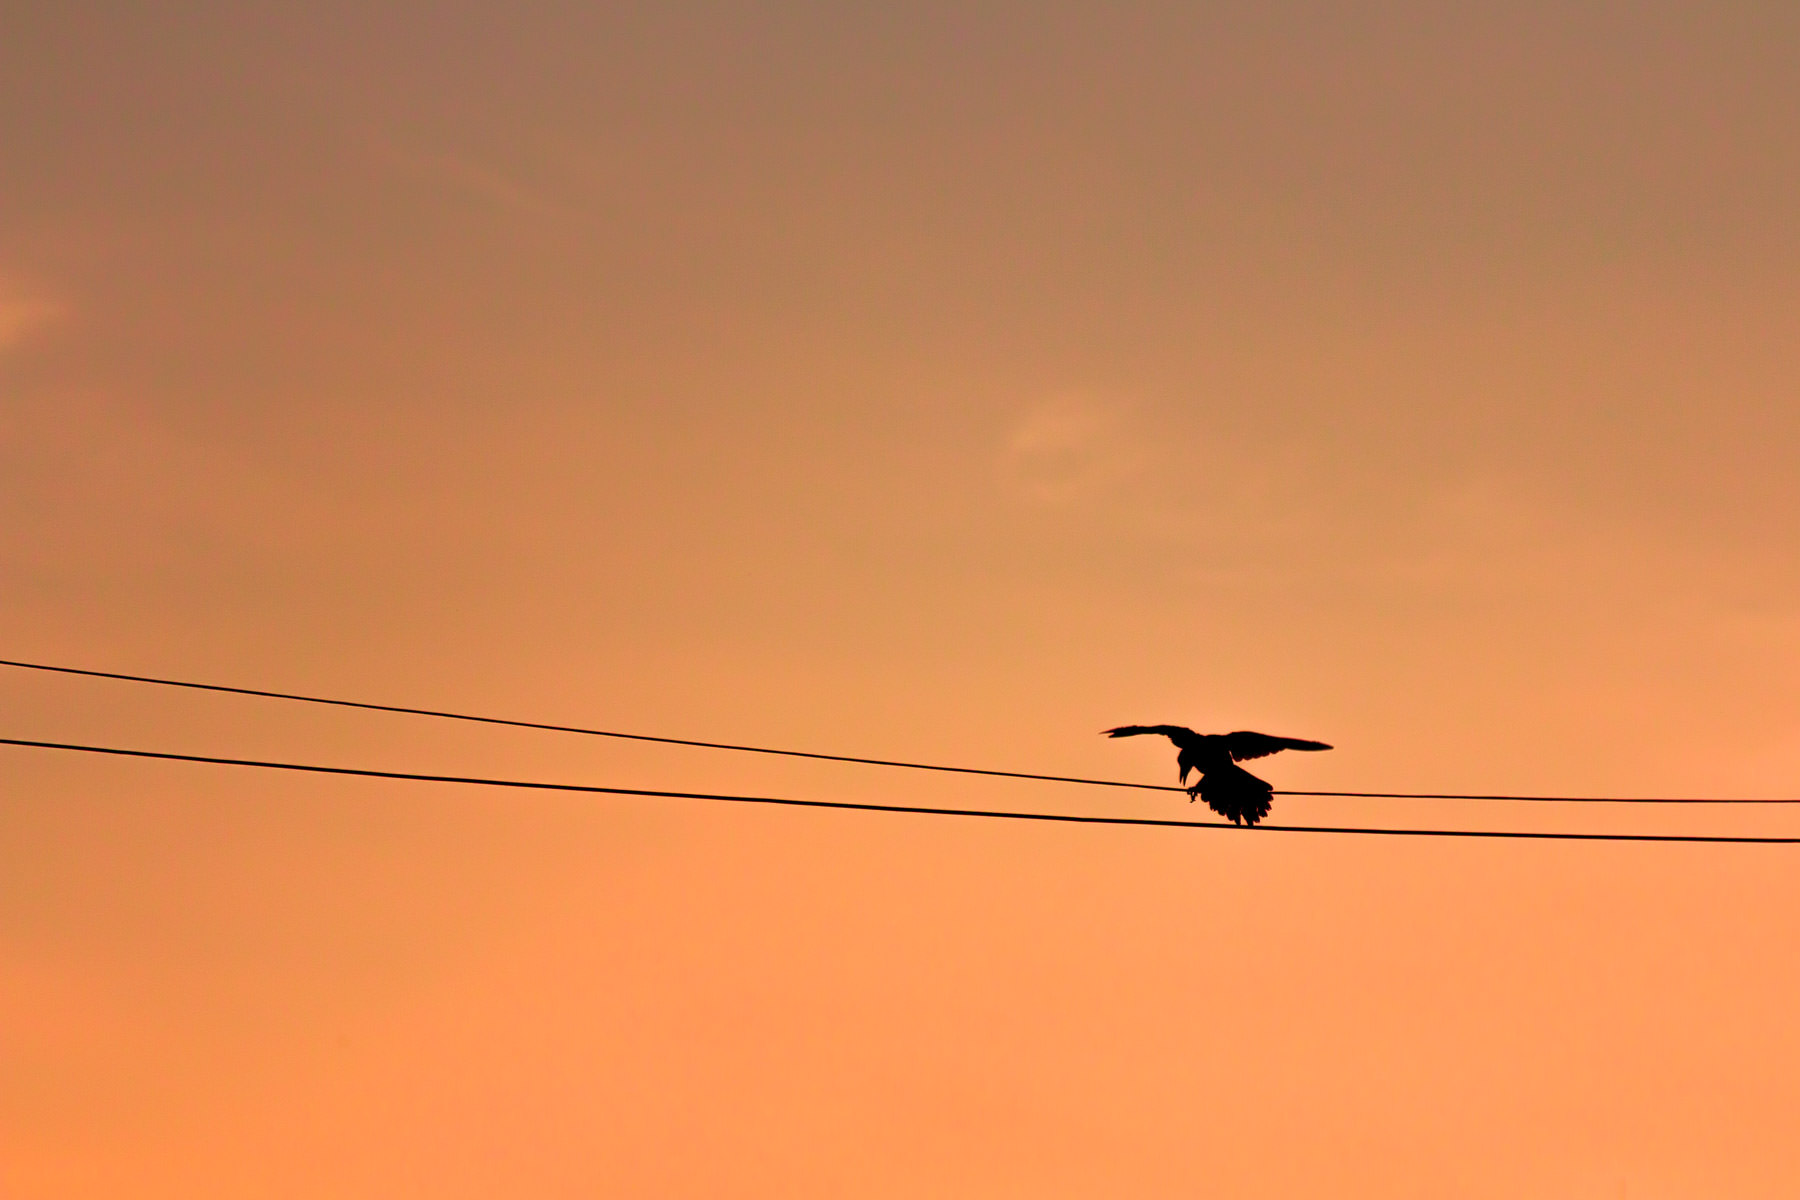 bird power line